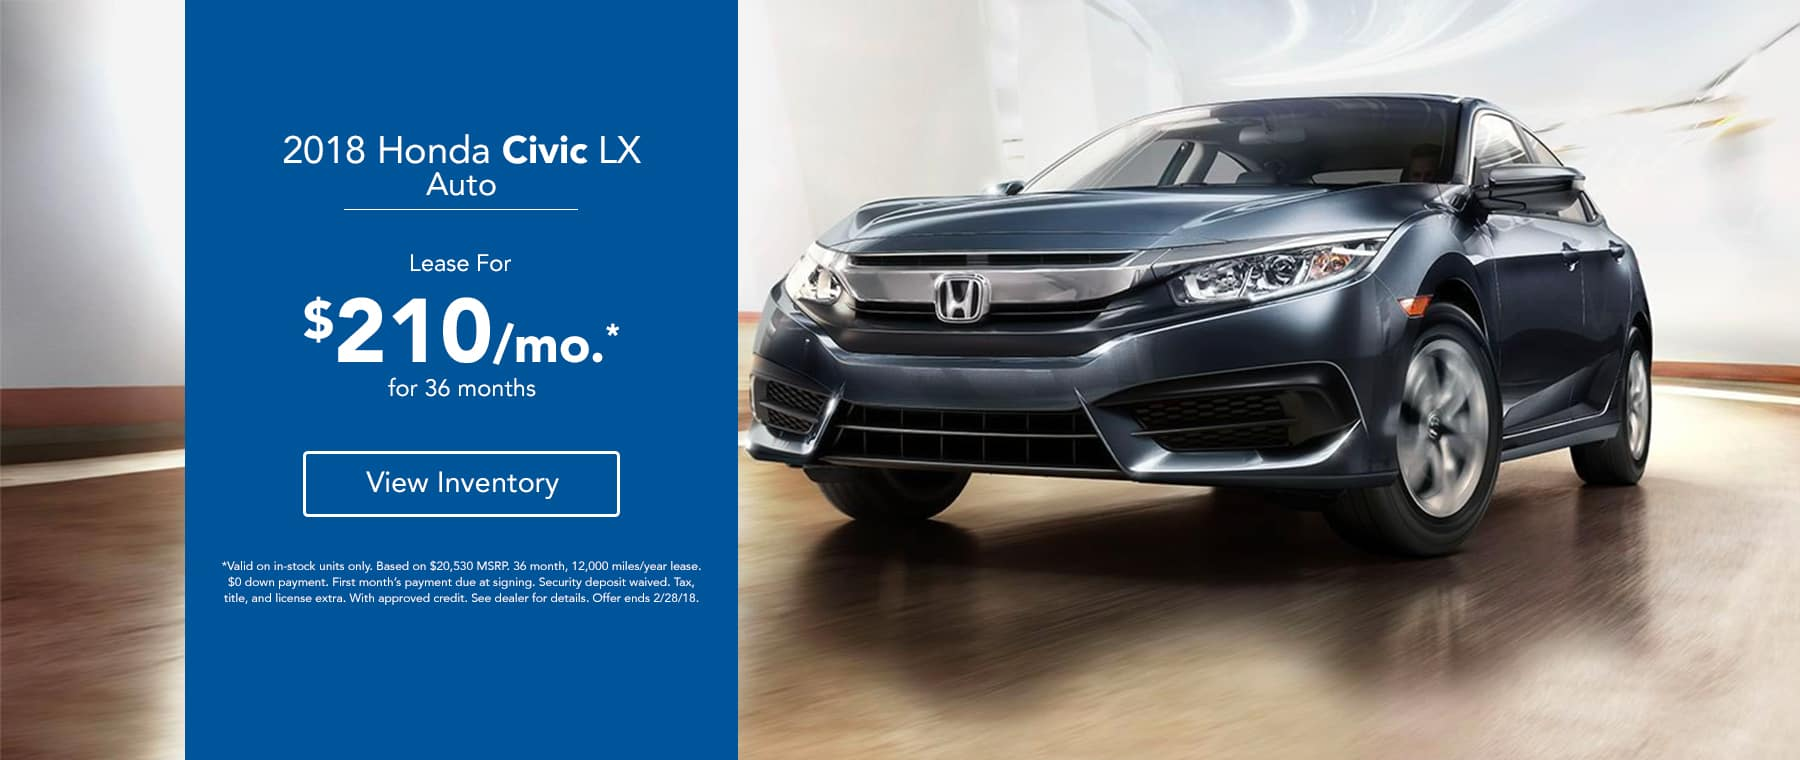 Legends Honda Civic